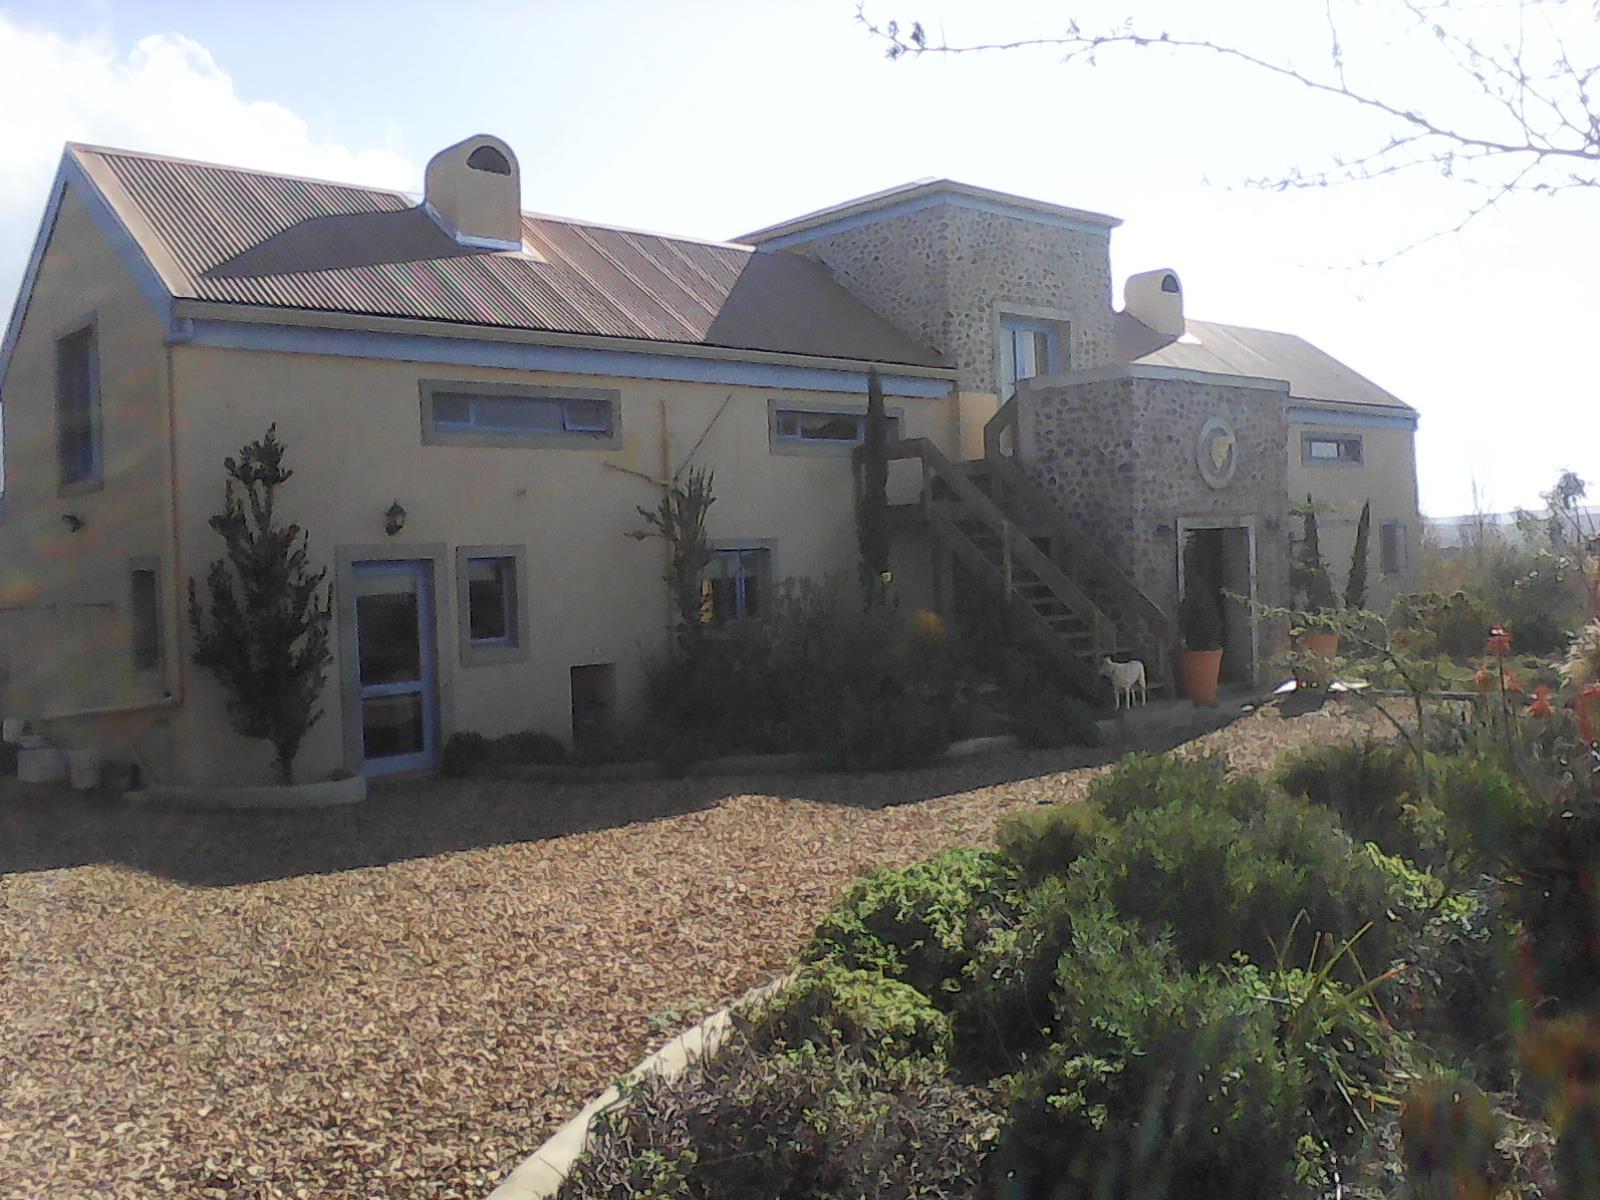 3 Bedroom House To Rent in Riebeek Kasteel